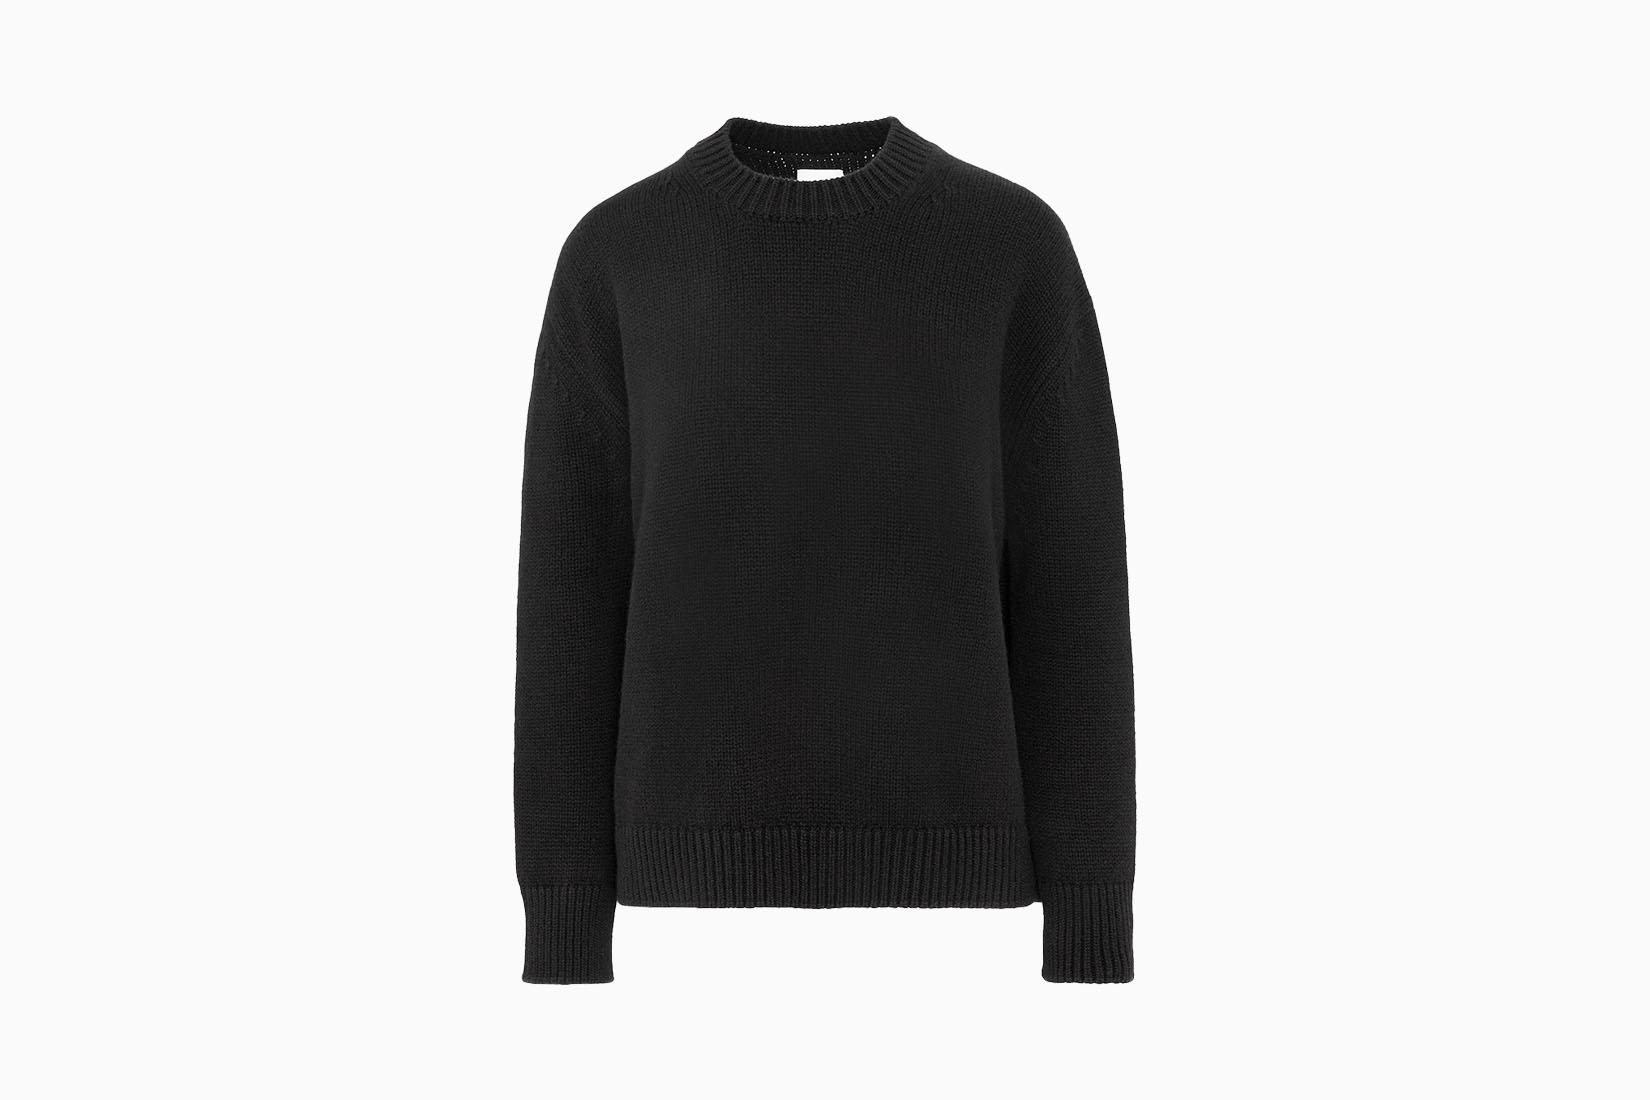 best cashmere sweaters women anine bing review Luxe Digital